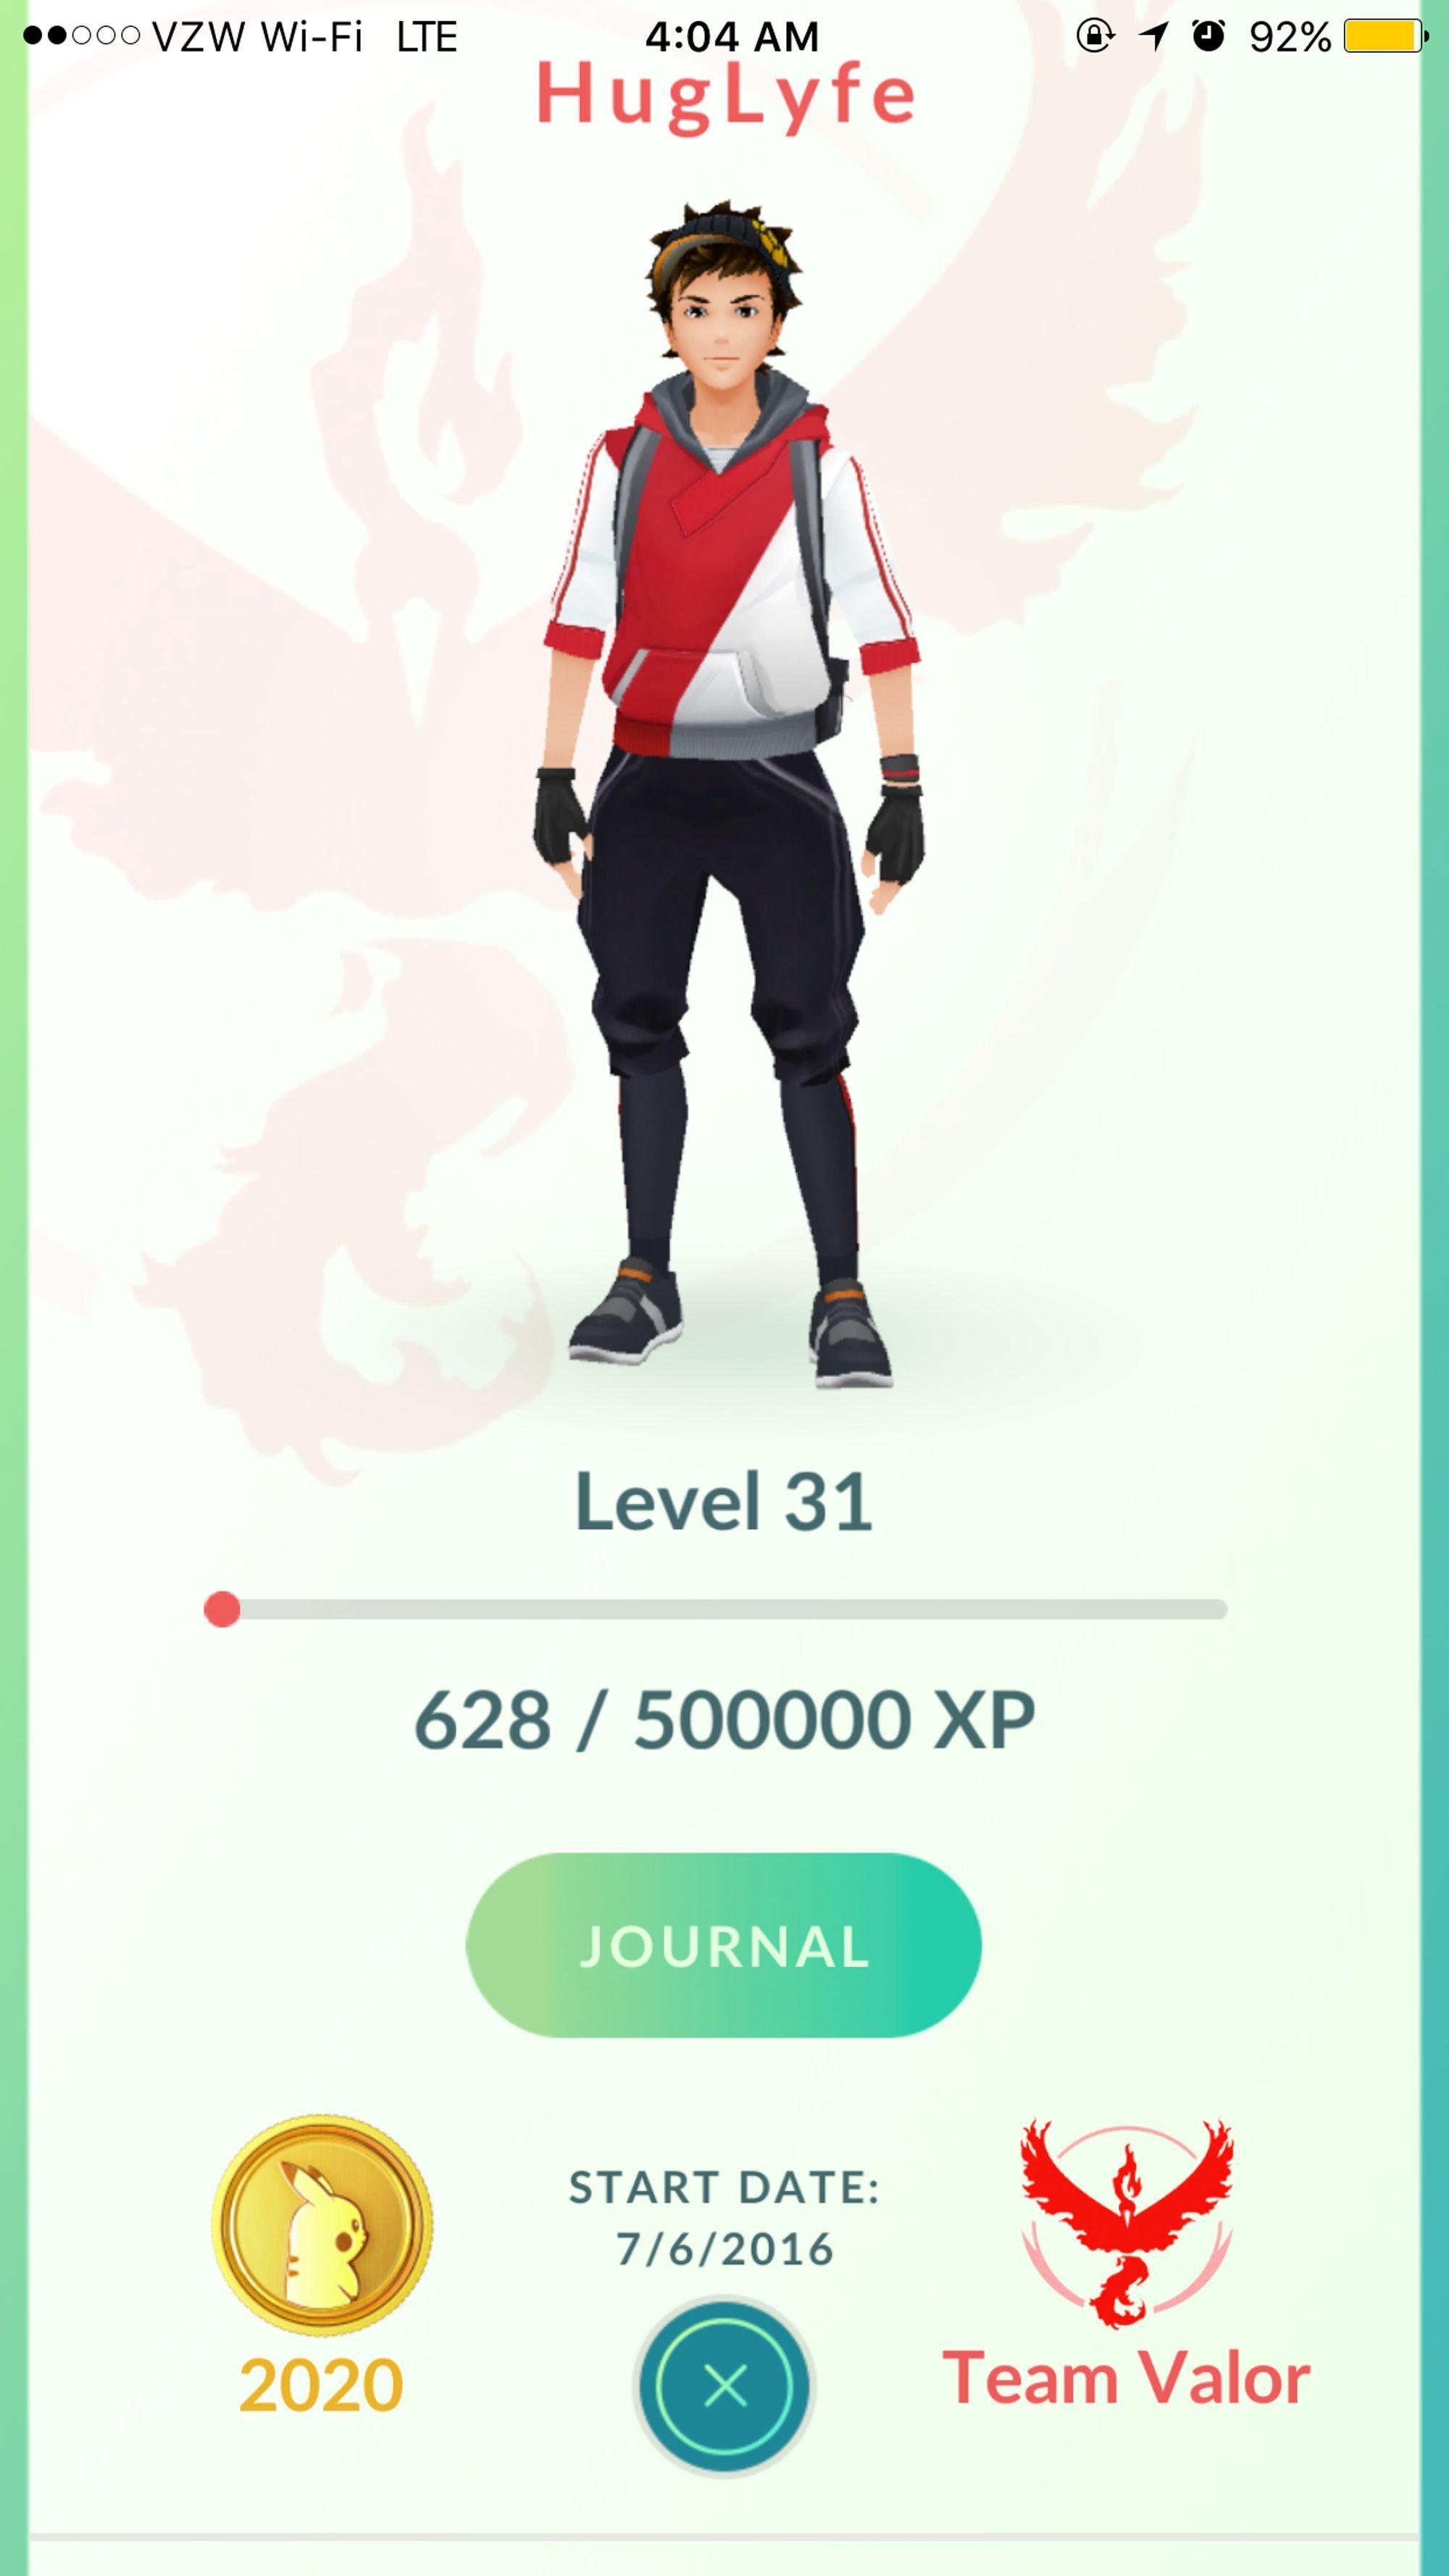 Meet The First Guy To Catch 'Em All In Pokémon Go